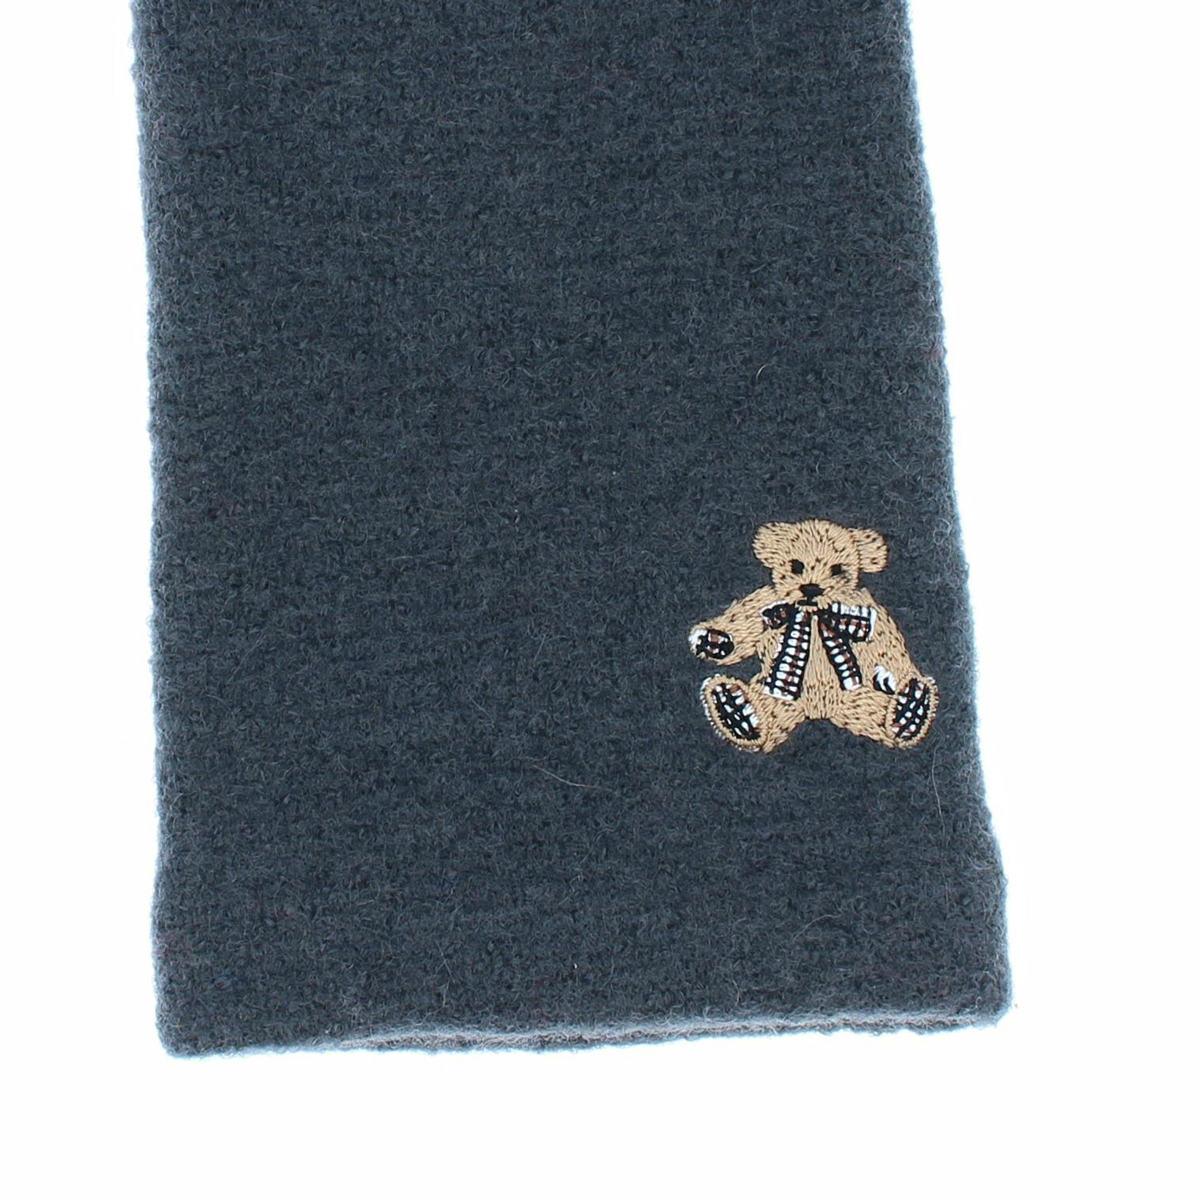 【SALE】DAKS レッキスファー指先 ウールジャージ 婦人手袋 テディベア刺繍 女性用21〜22cm(M)